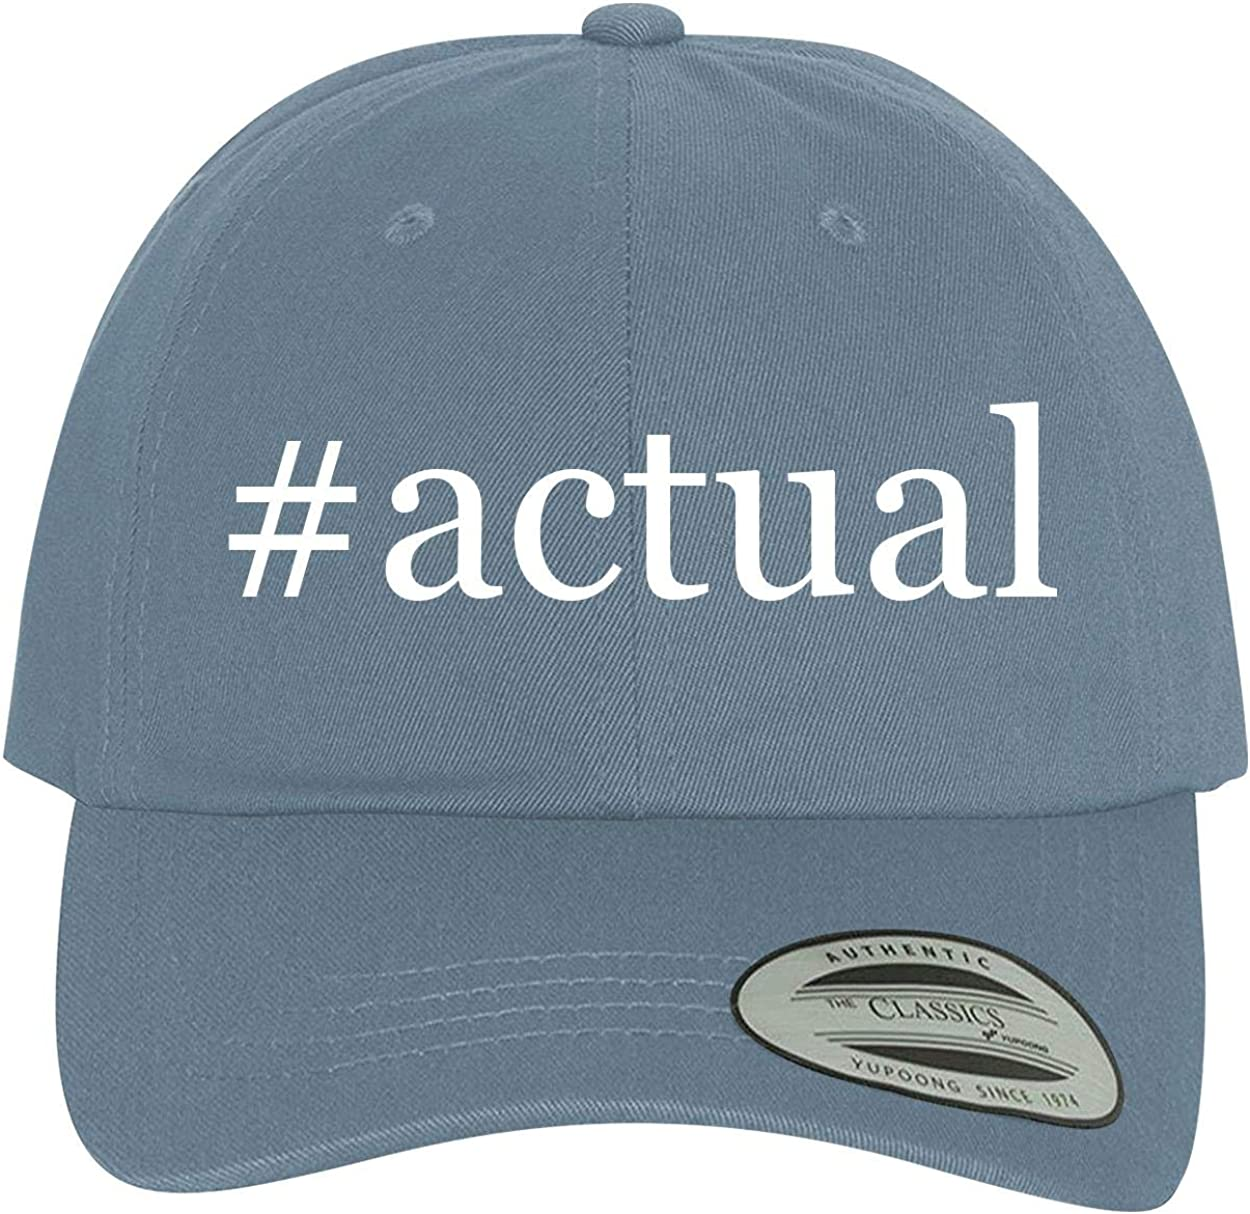 Comfortable Dad Hat Baseball Cap BH Cool Designs #Actual